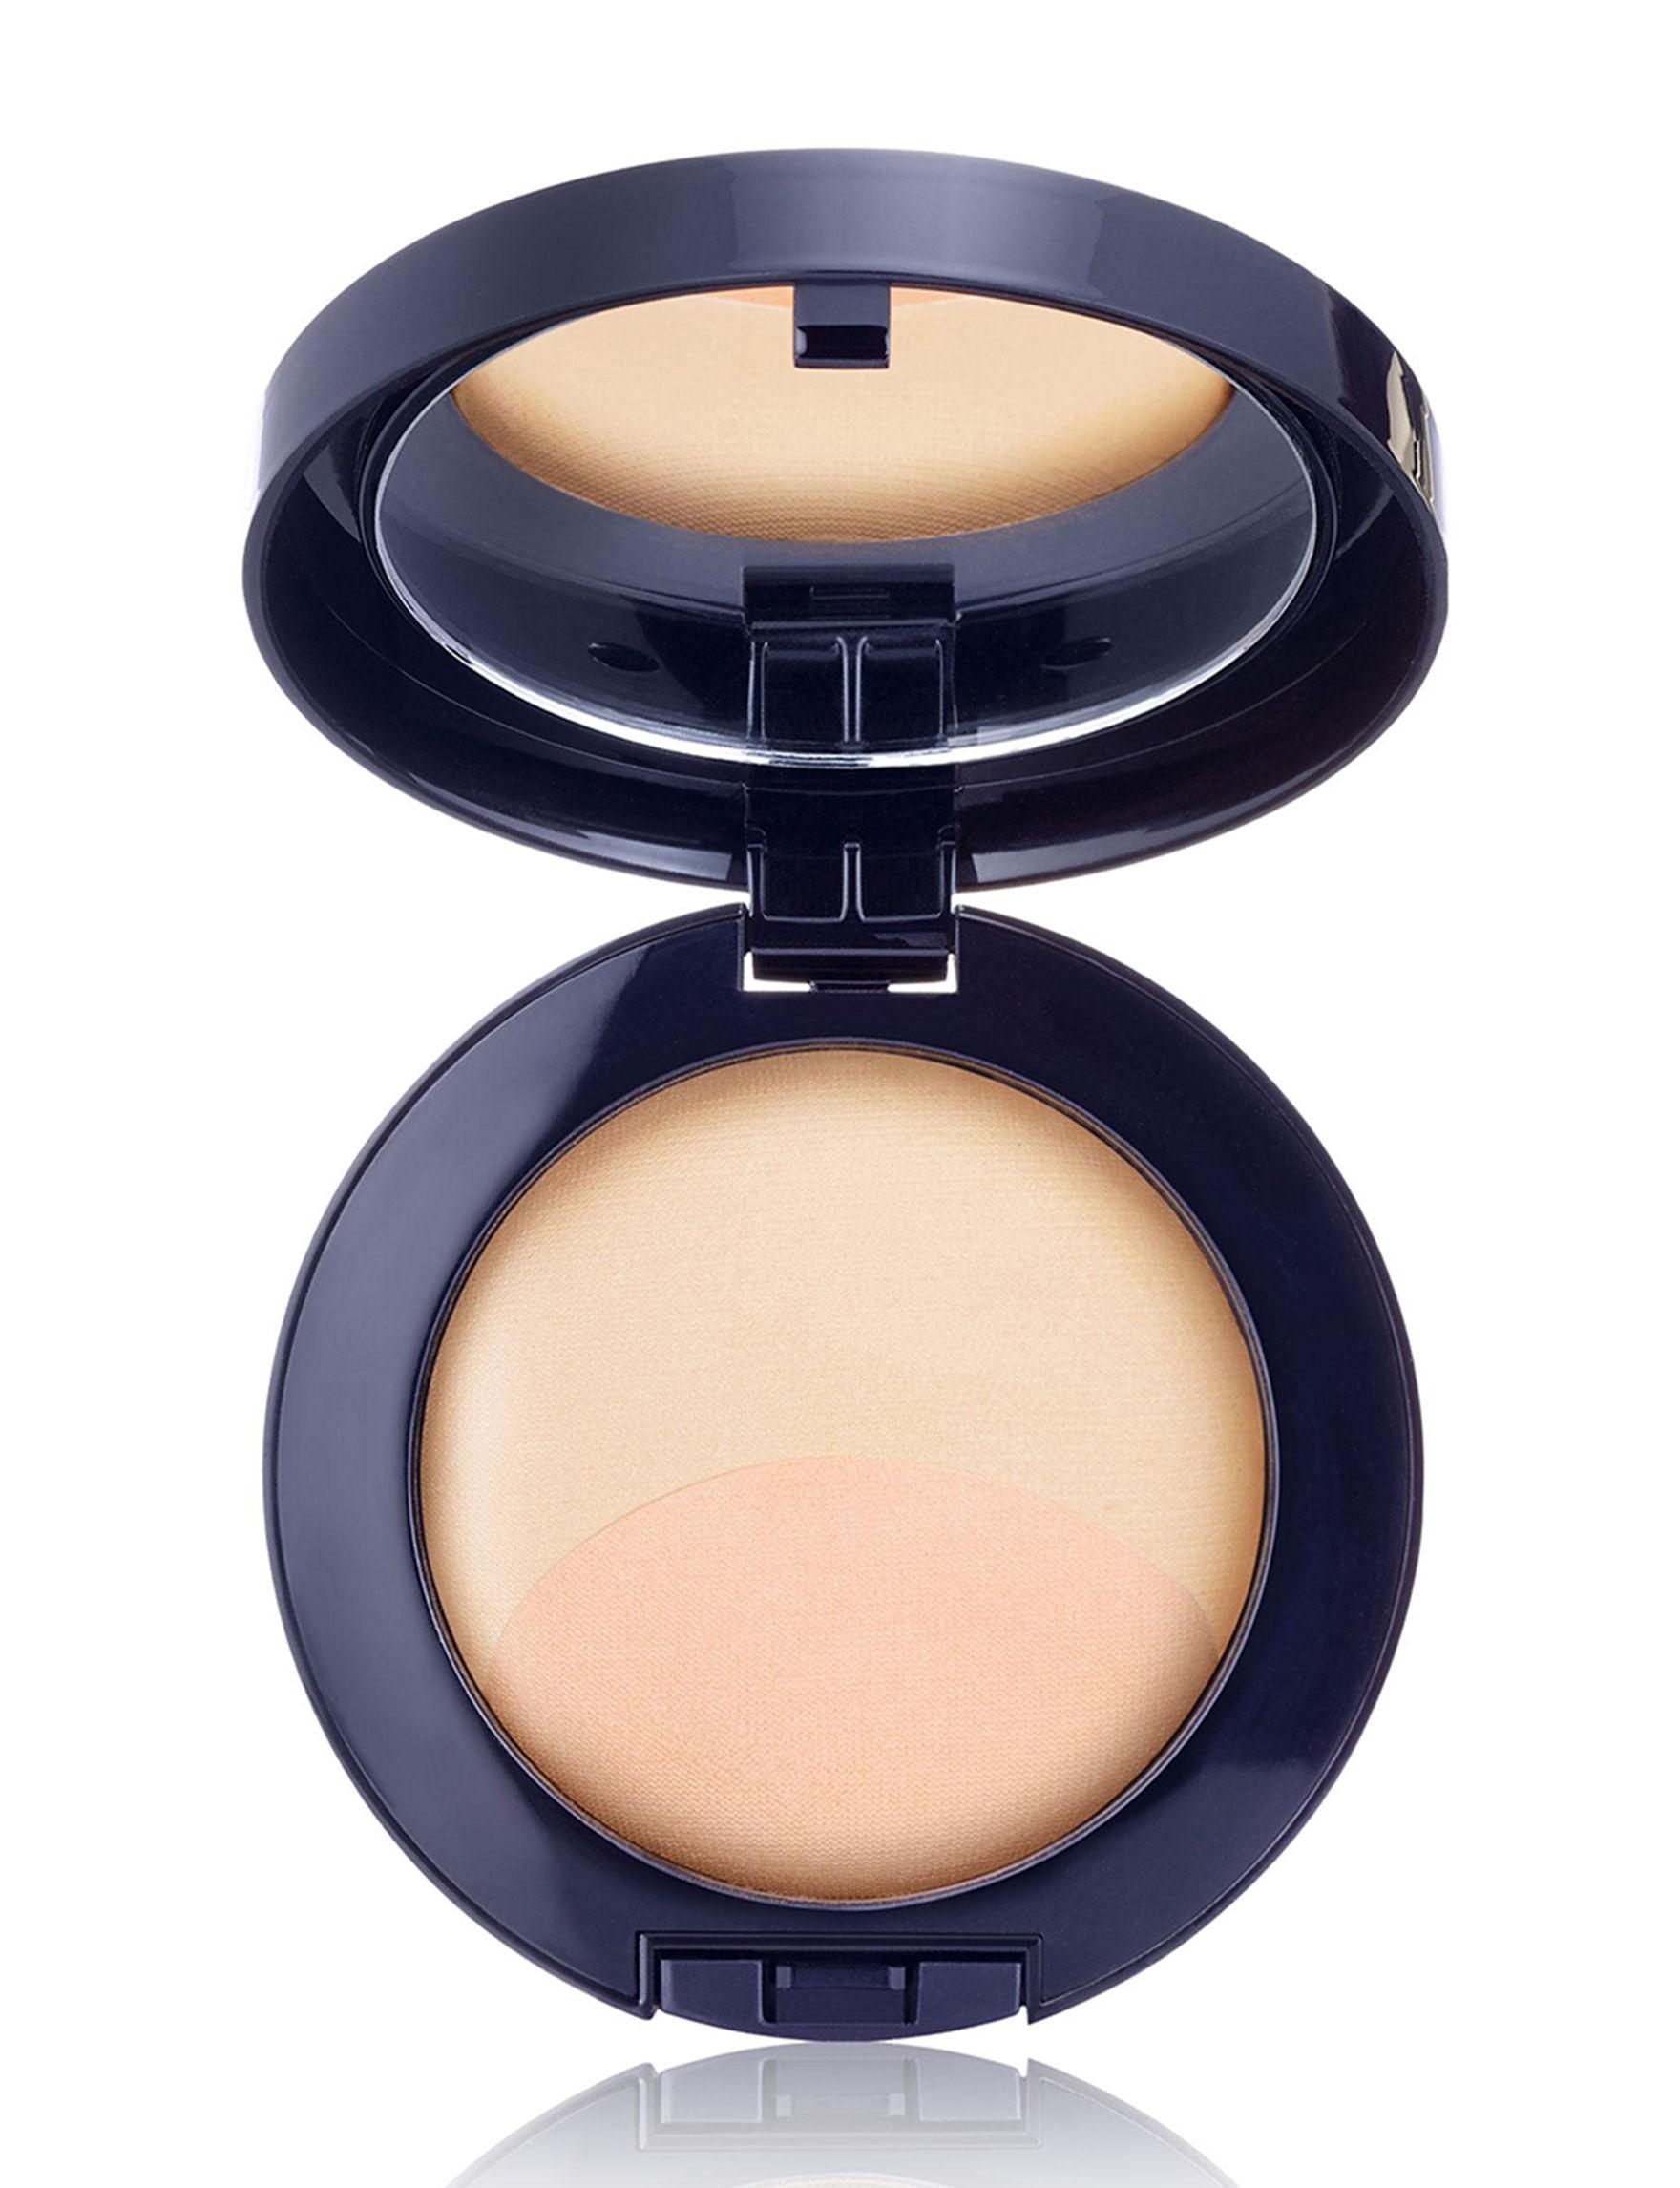 Estee Lauder Translucent Face Highlighter Powder